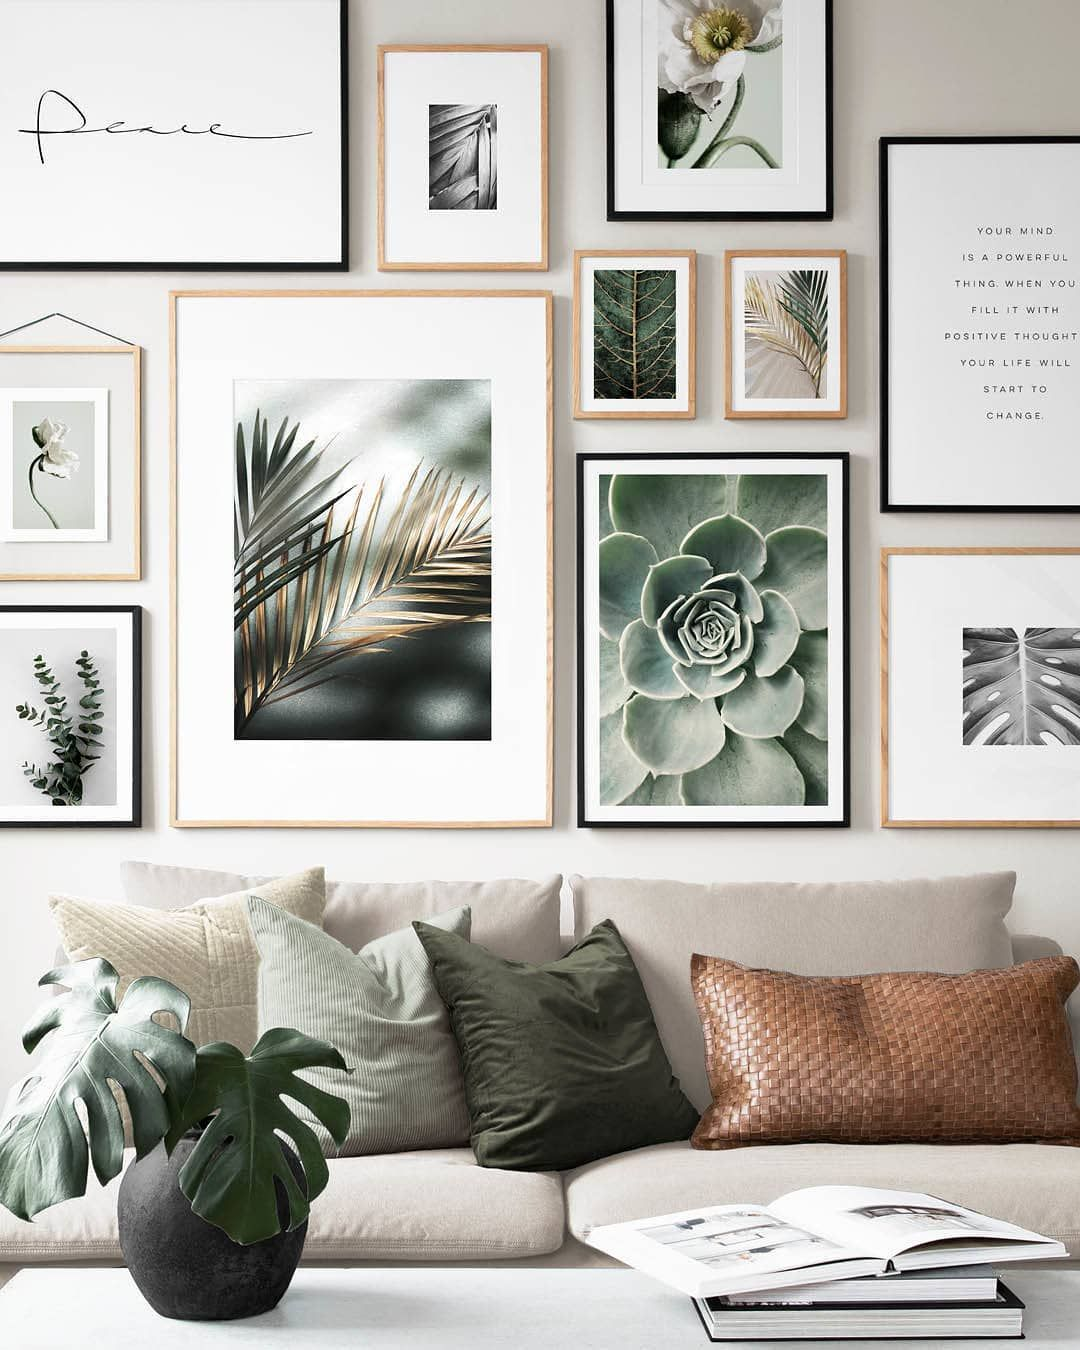 Lush Living Designs Peace Handwriting 50x70 Cm Palm 30x40 Cm White Pop Picture Wall Living Room Gallery Wall Living Room Living Room Pictures